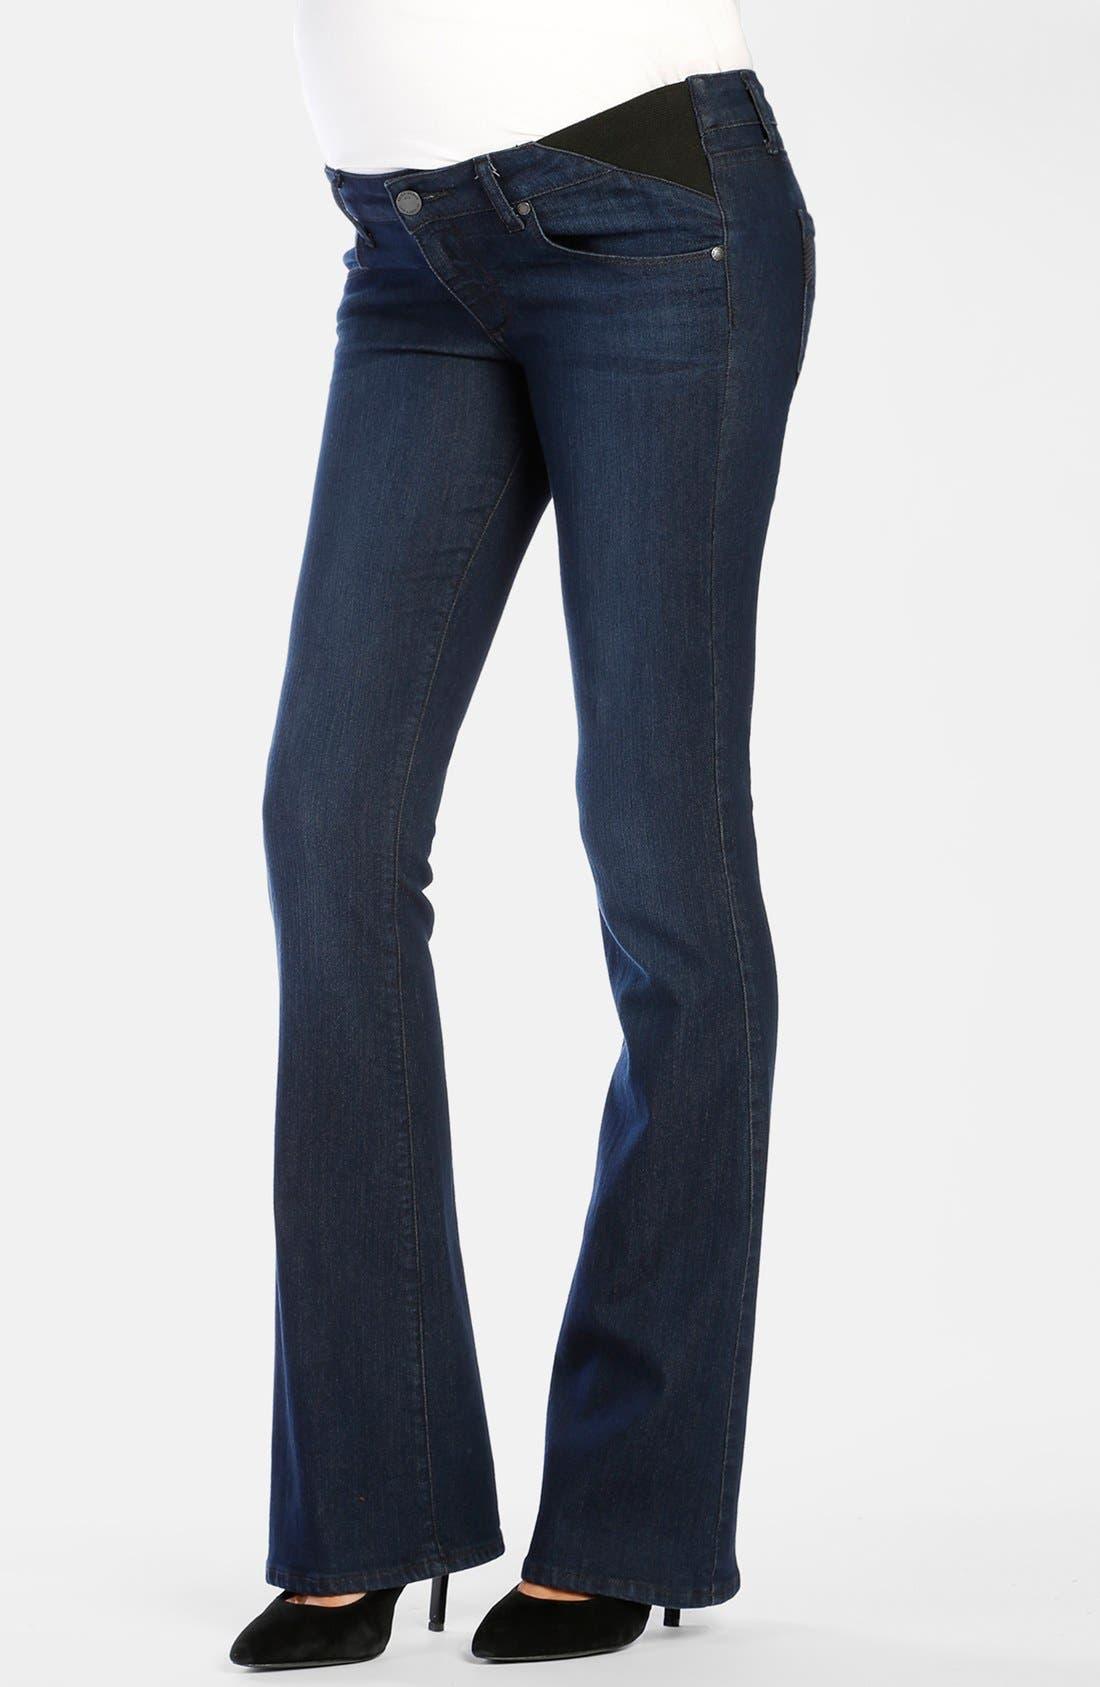 Main Image - Paige Denim 'Skyline' Bootcut Maternity Jeans (Alexis)